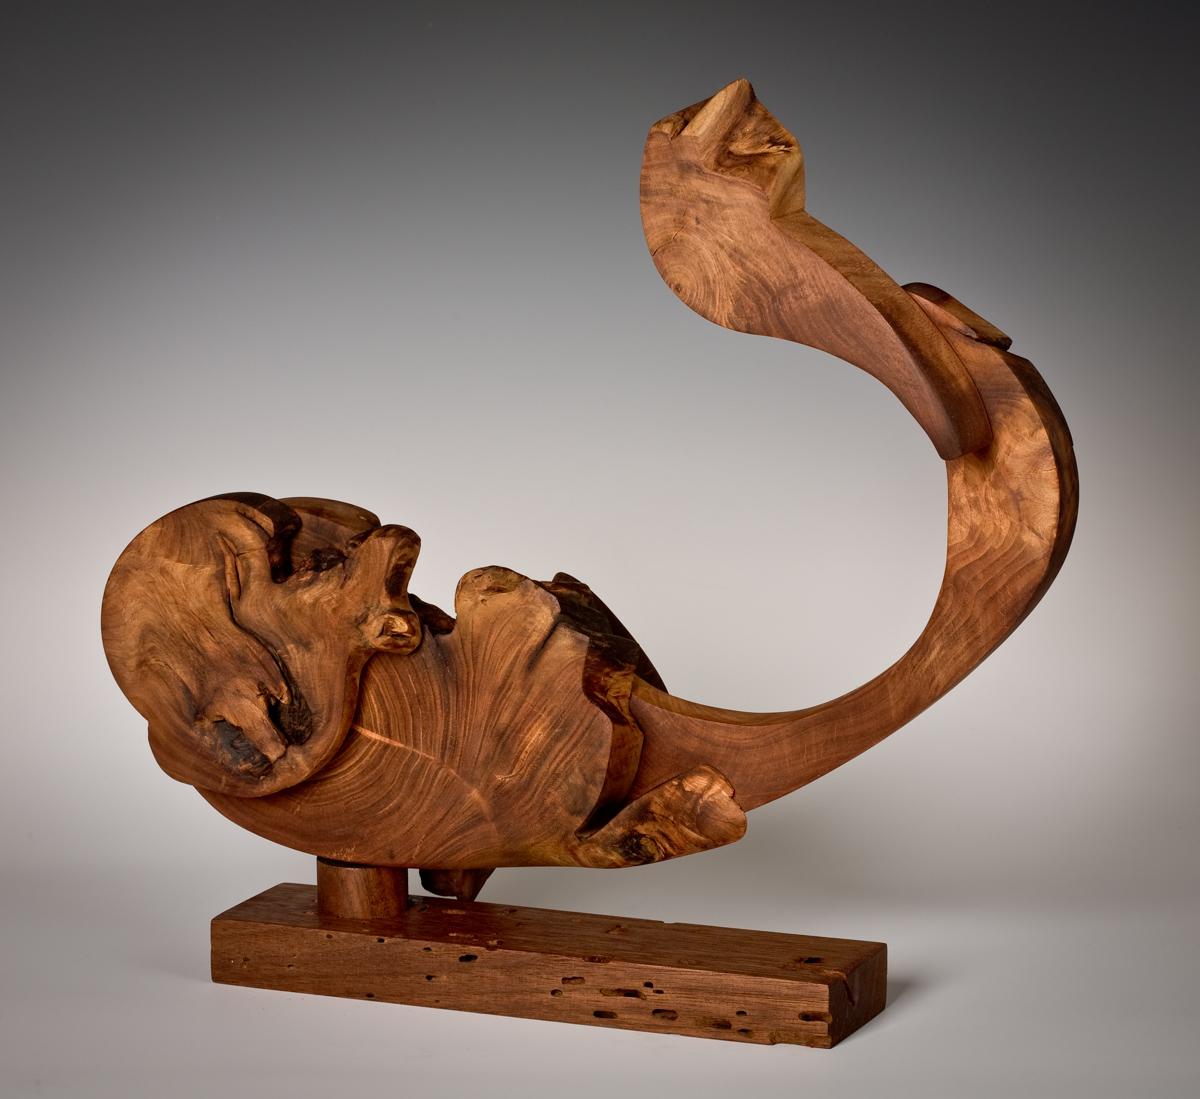 Wood Sculpture by: Barbara barss